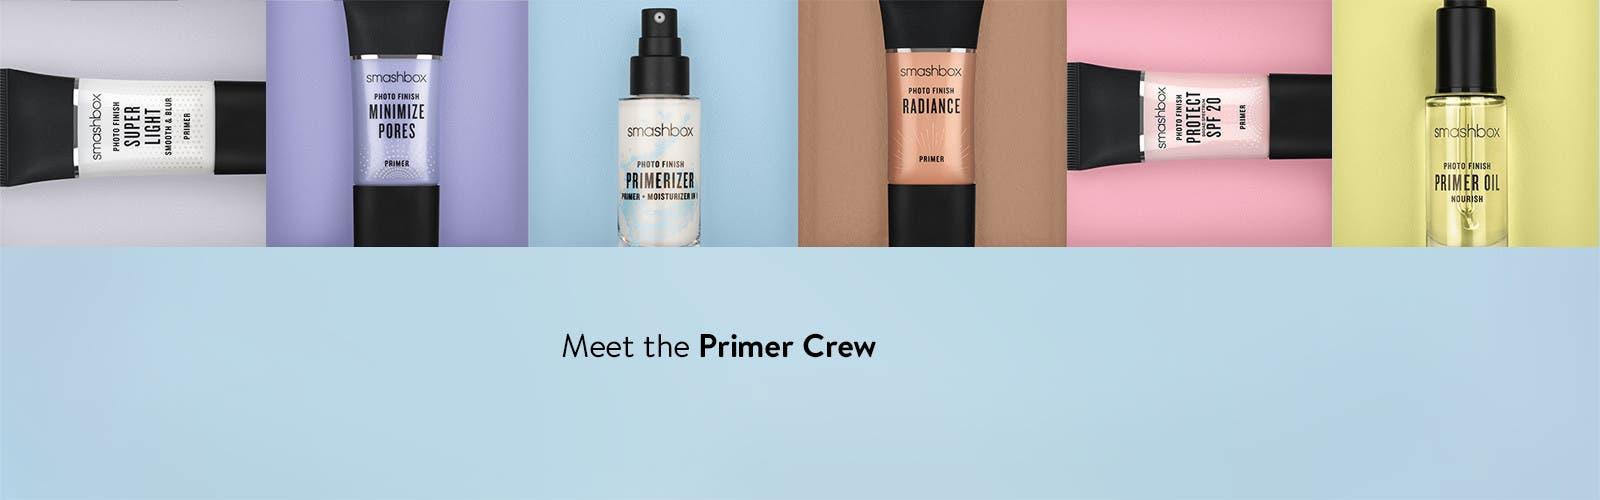 Meet the Smashbox primer crew.